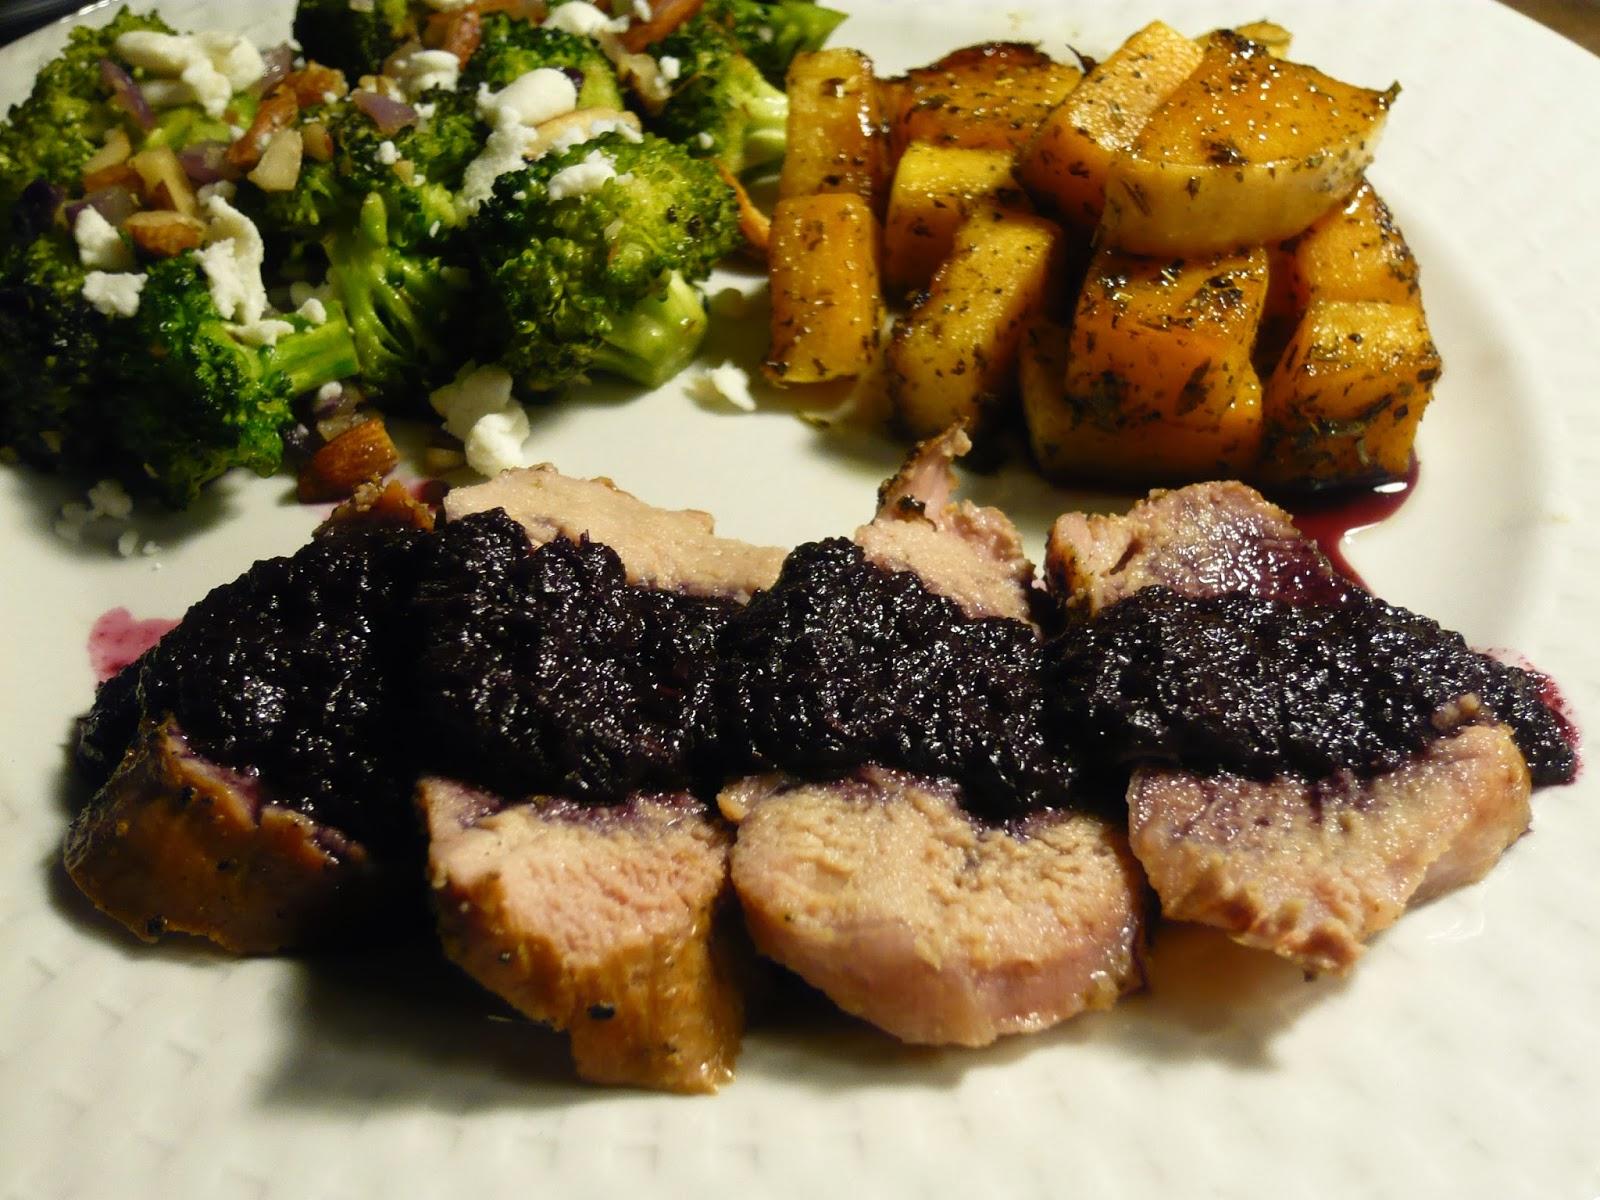 ... Contest: Grilled Pork Tenderloin with Citrus Blueberry Balsamic Sauce